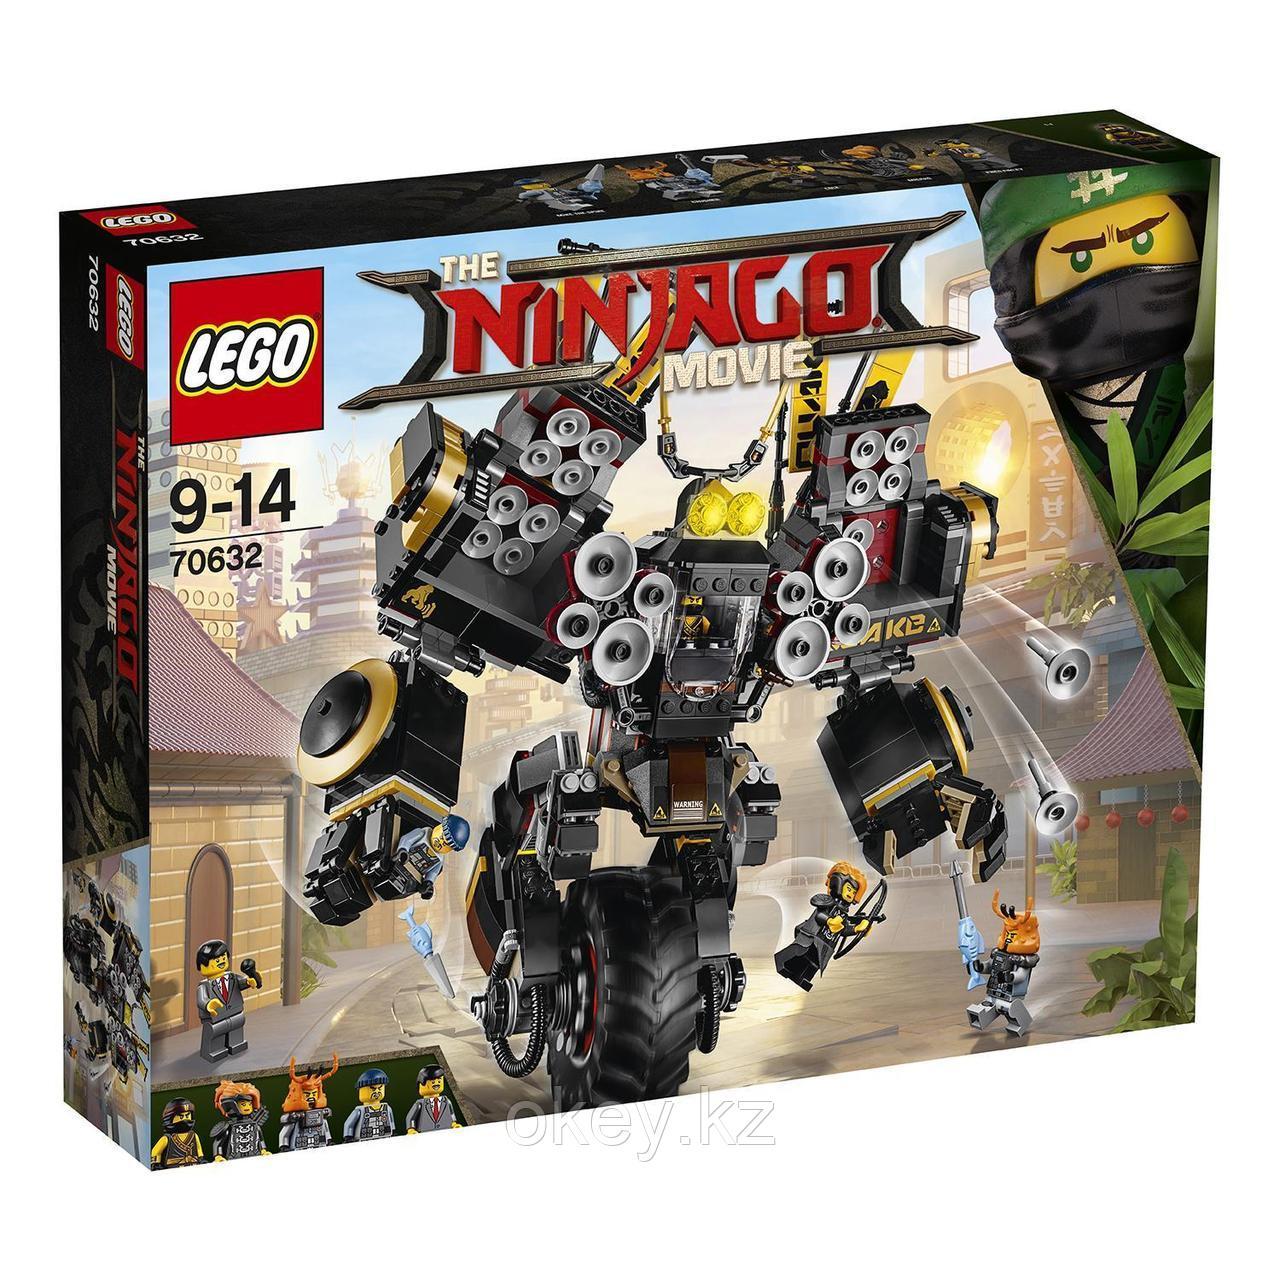 LEGO Ninjago Movie: Робот землетрясений 70632